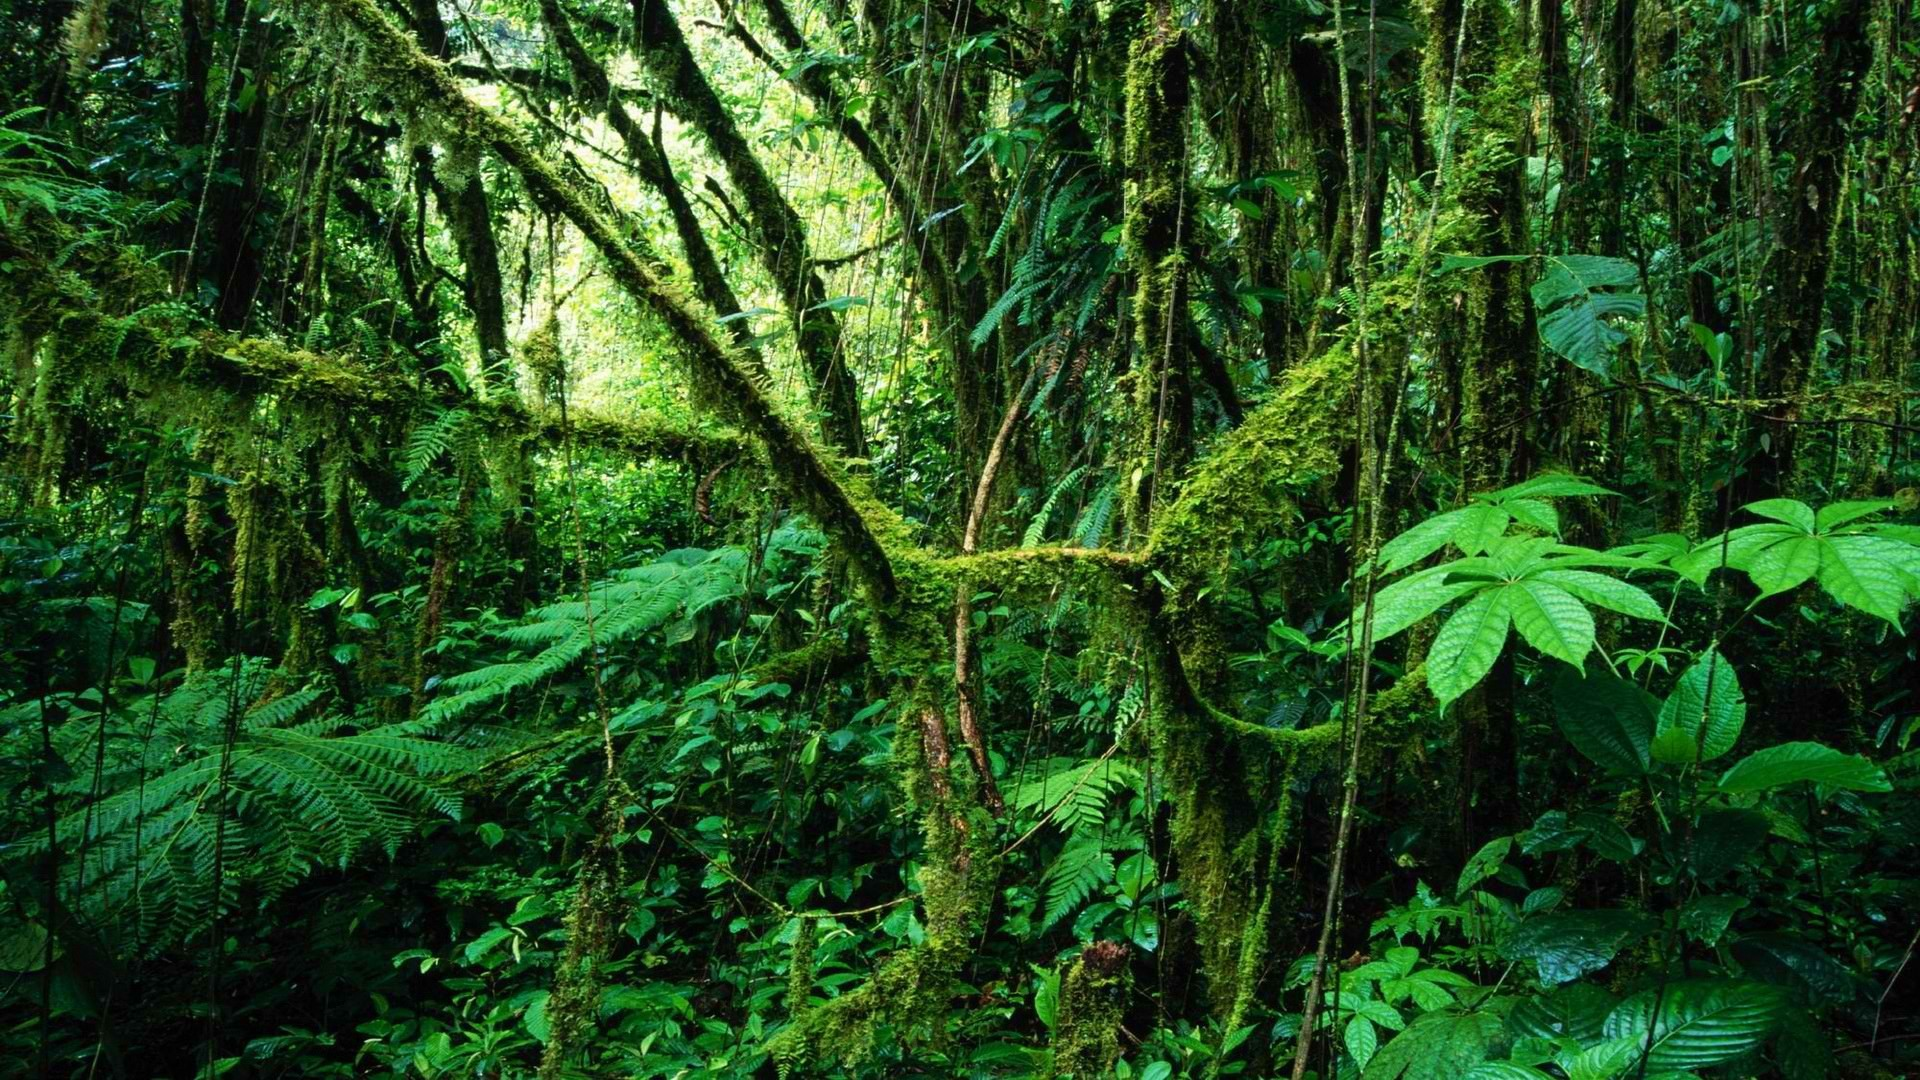 Rainforest Wallpaper (61+ Images